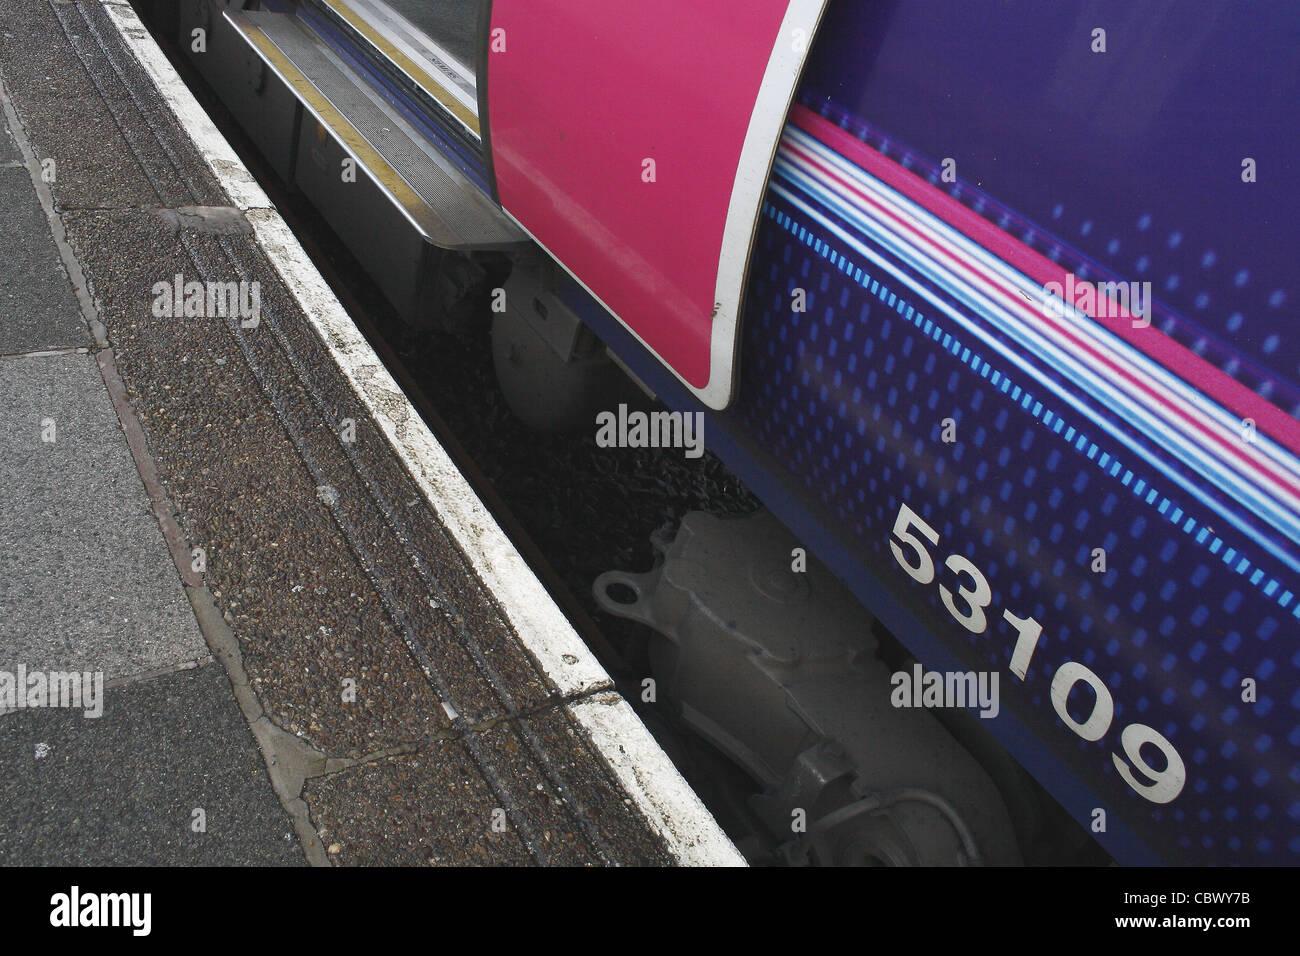 northern rail train at blackpool train station Blackpool, Lancashire, England, UK - Stock Image